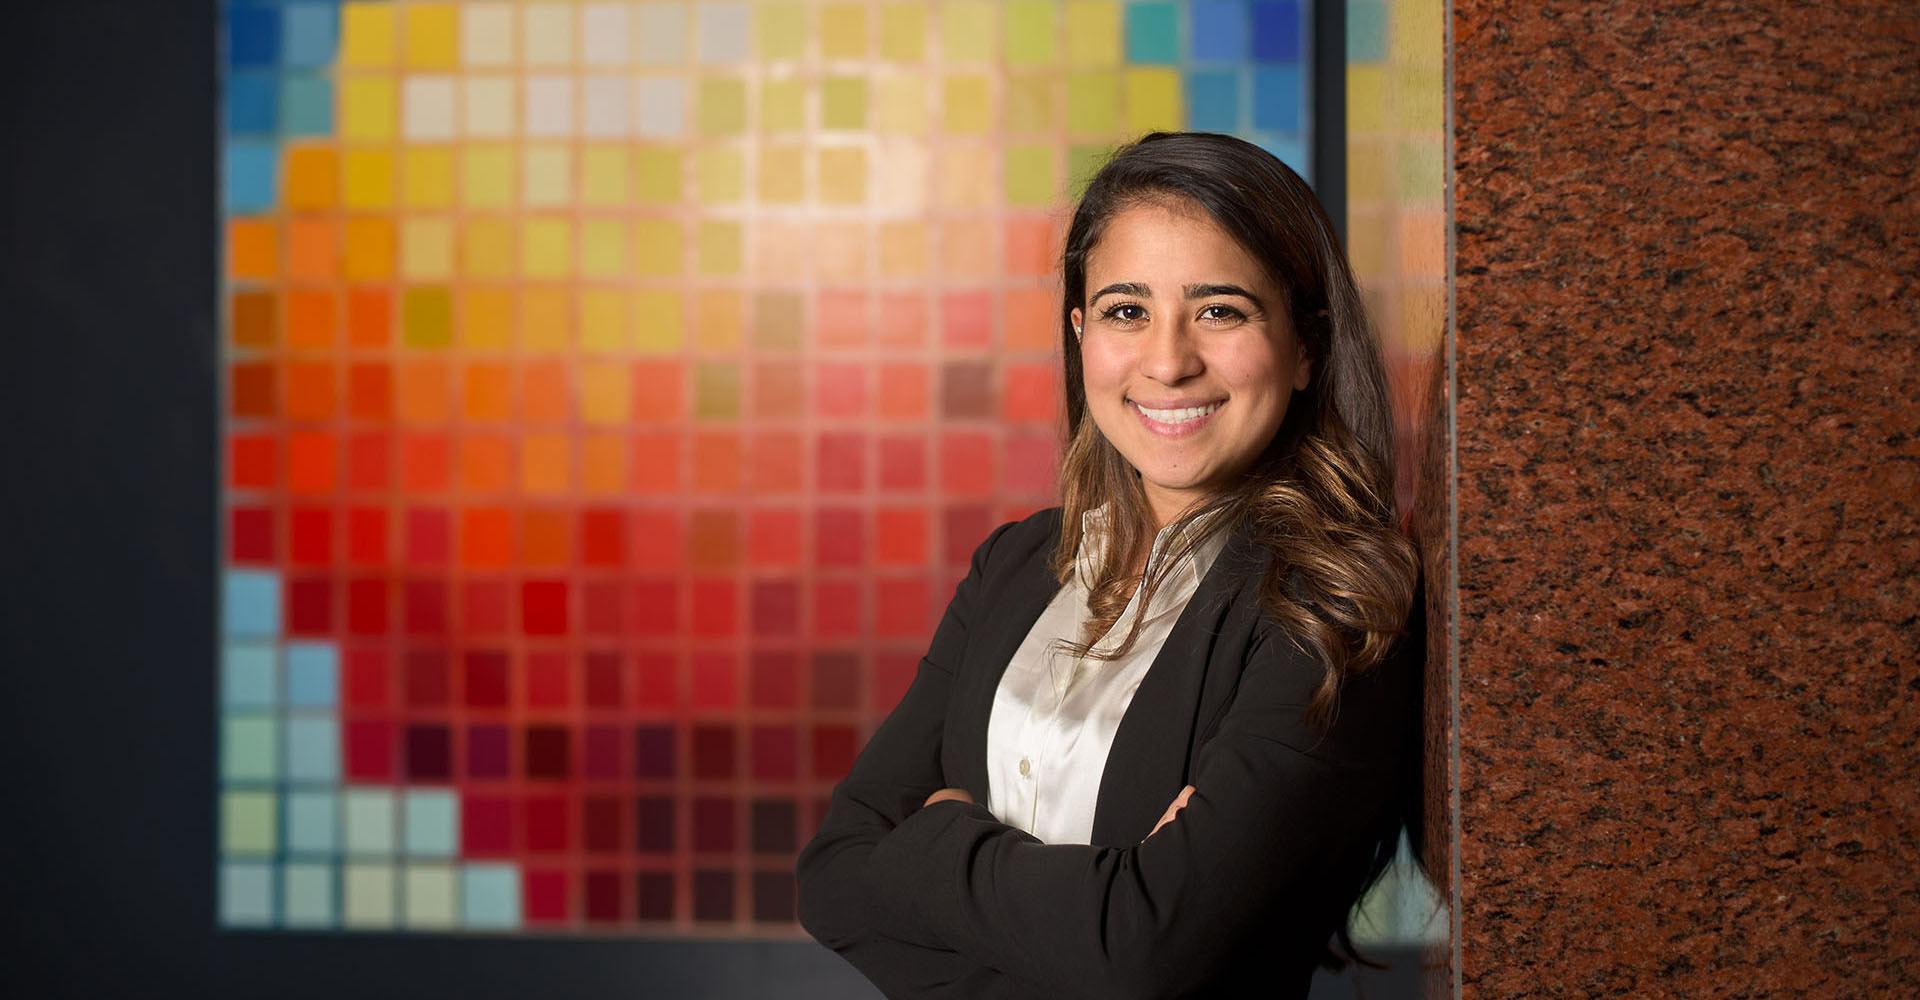 Sara Mostatabi